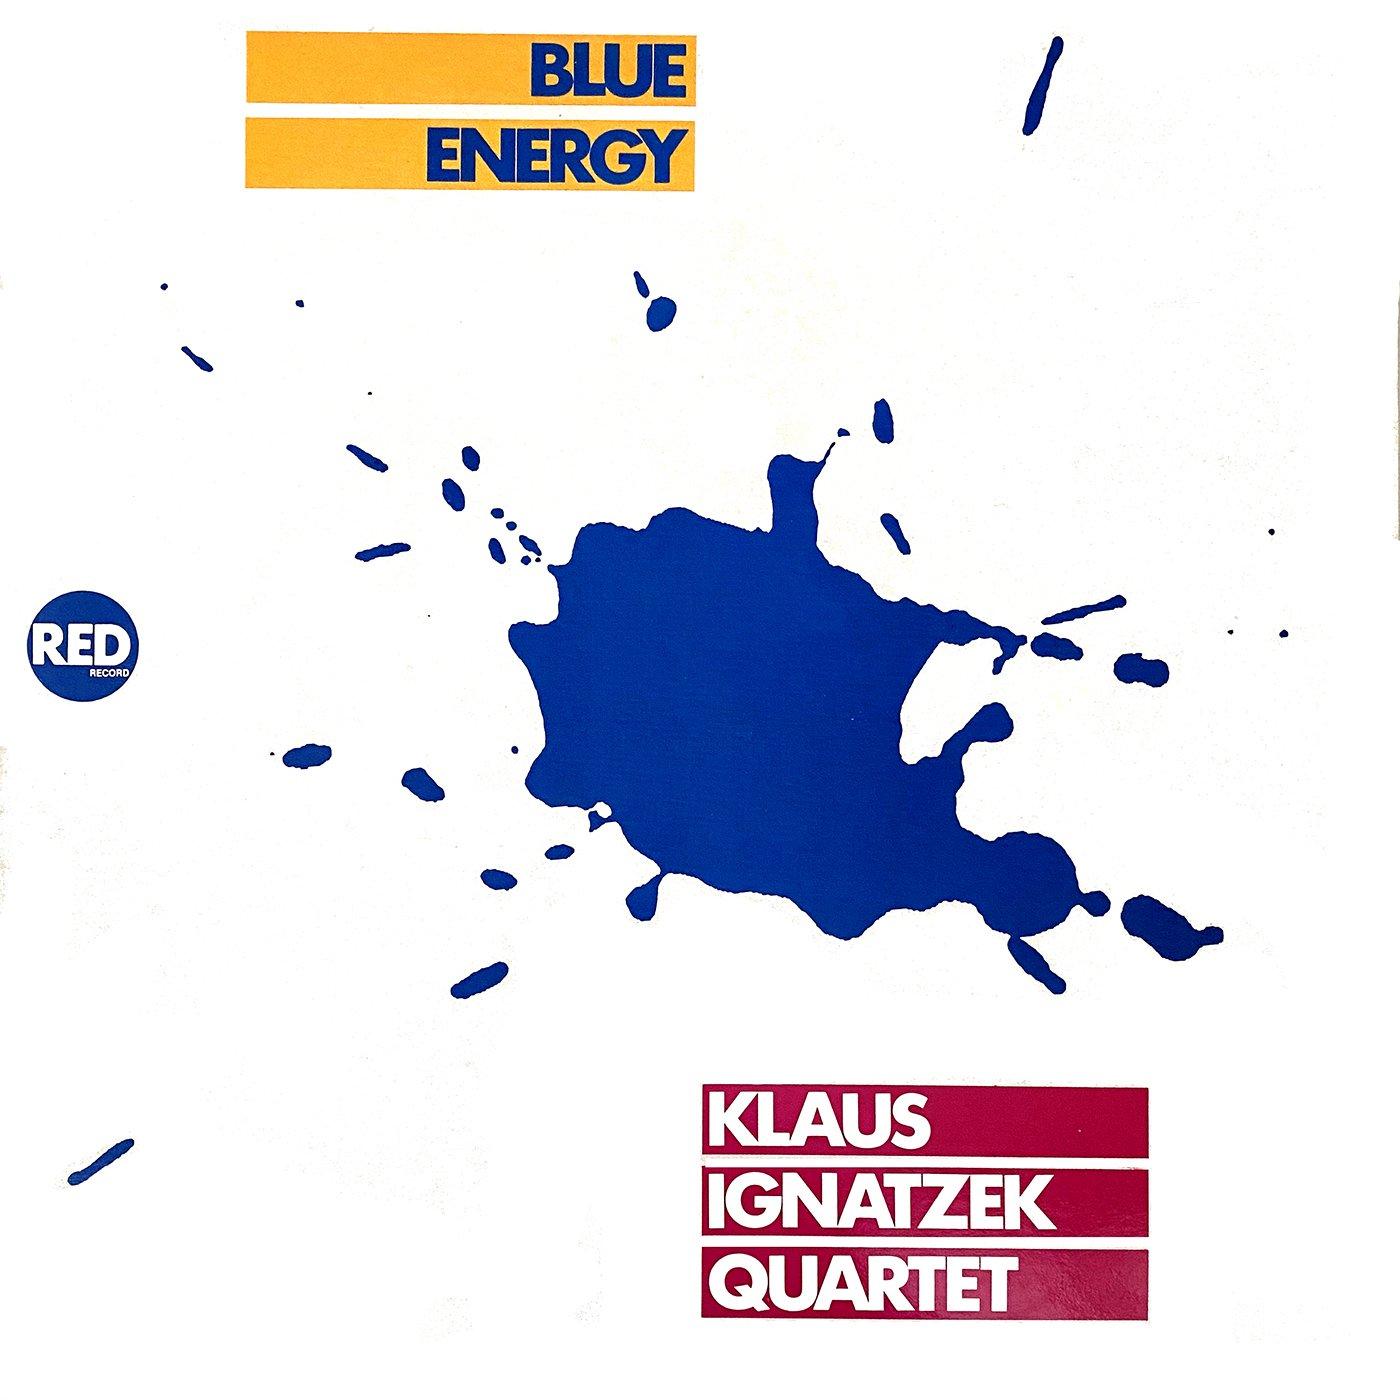 Blue Energy - Klaus Ignatzek Quartet